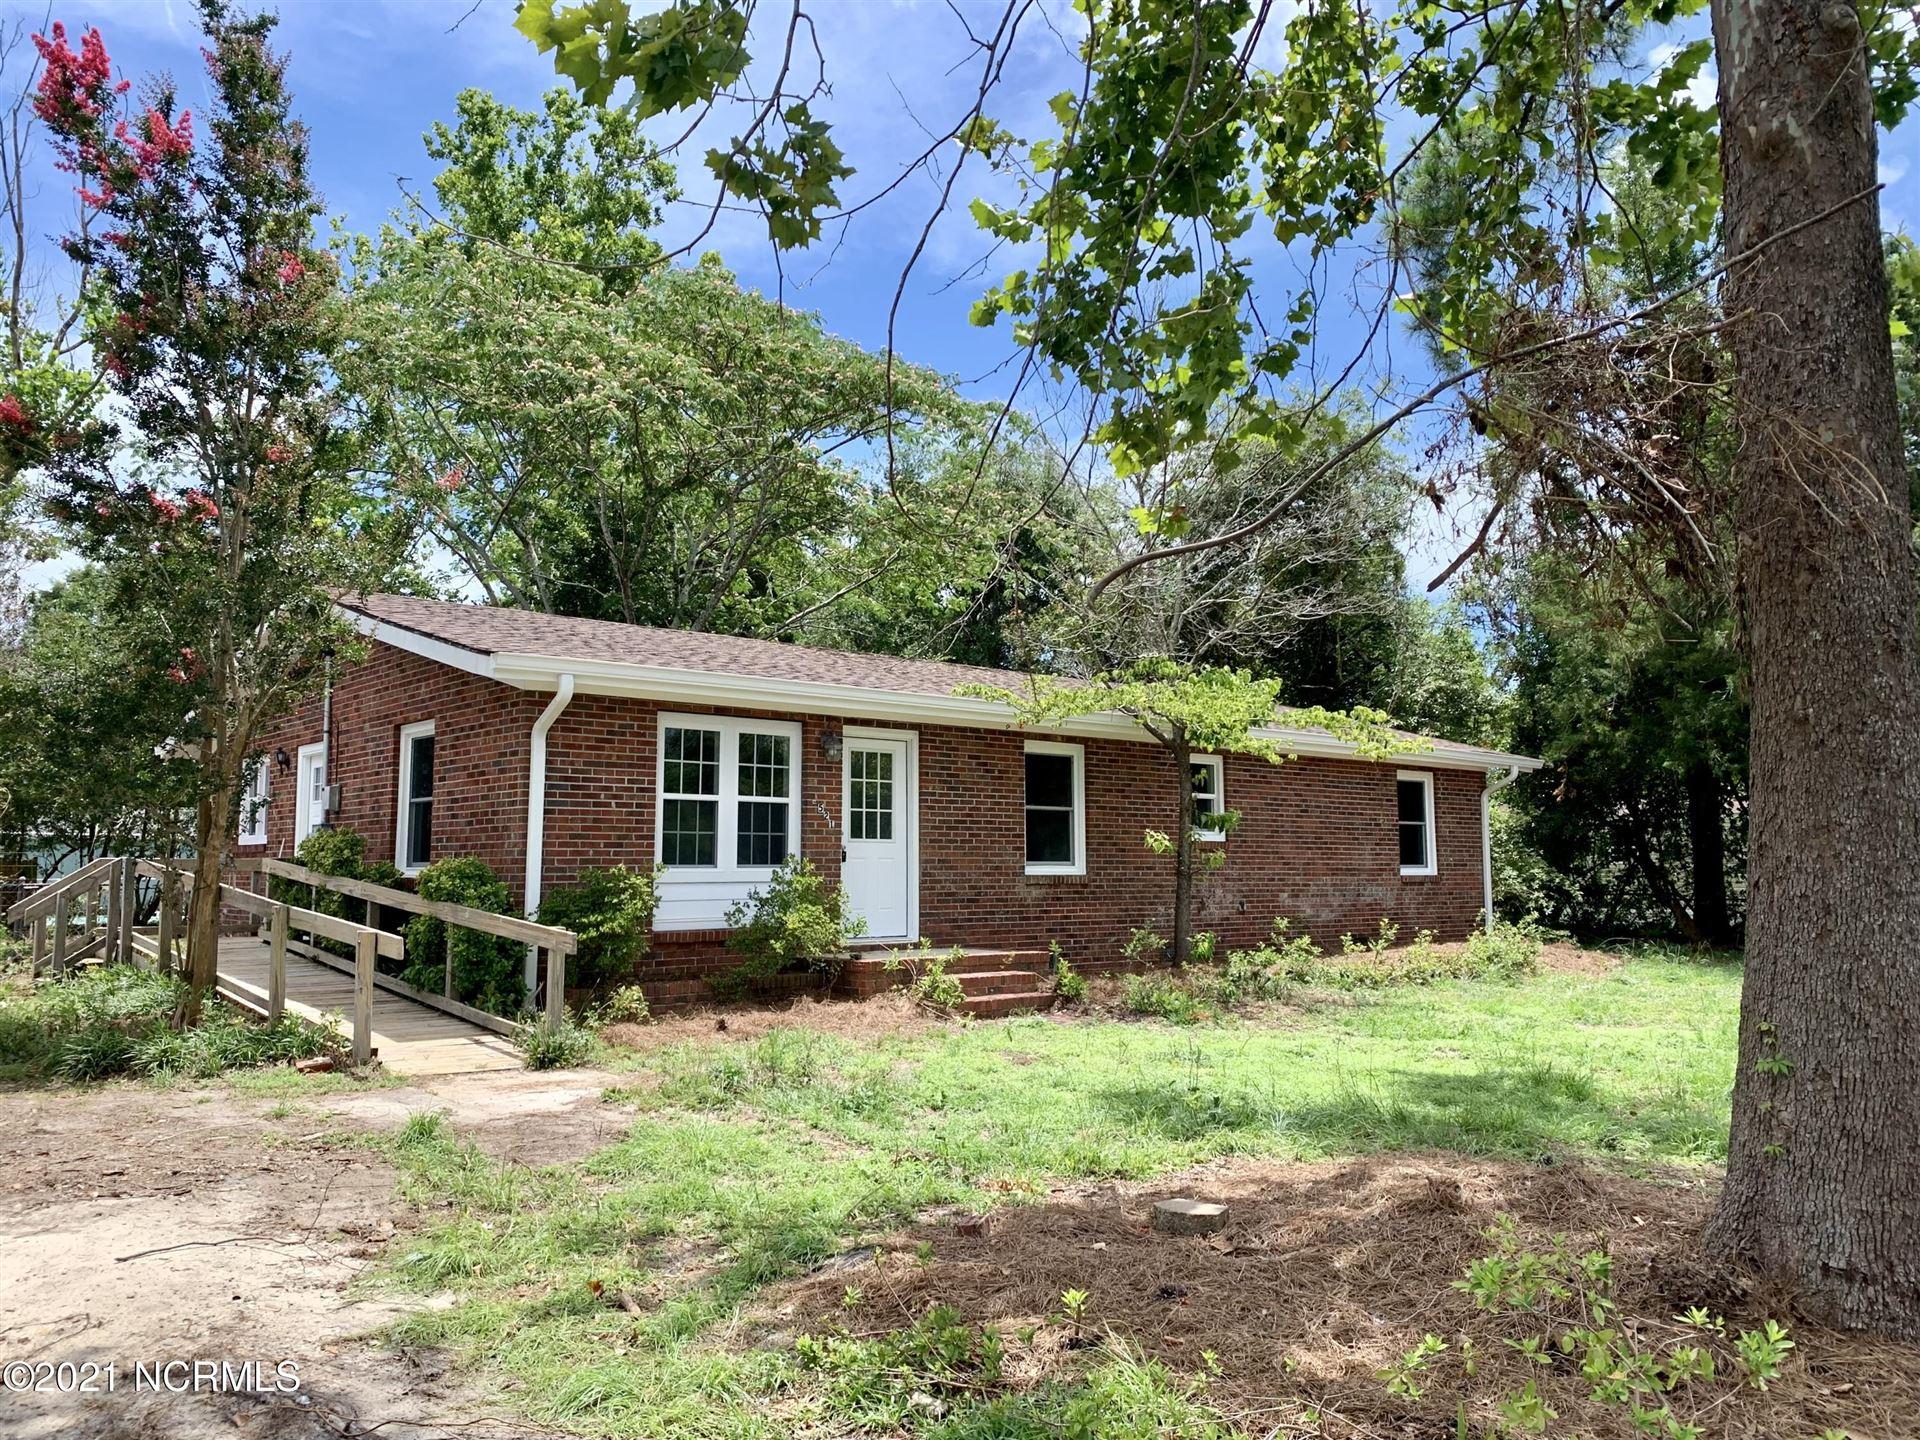 Photo of 5521 Pine Glen Street SE, Southport, NC 28461 (MLS # 100296235)